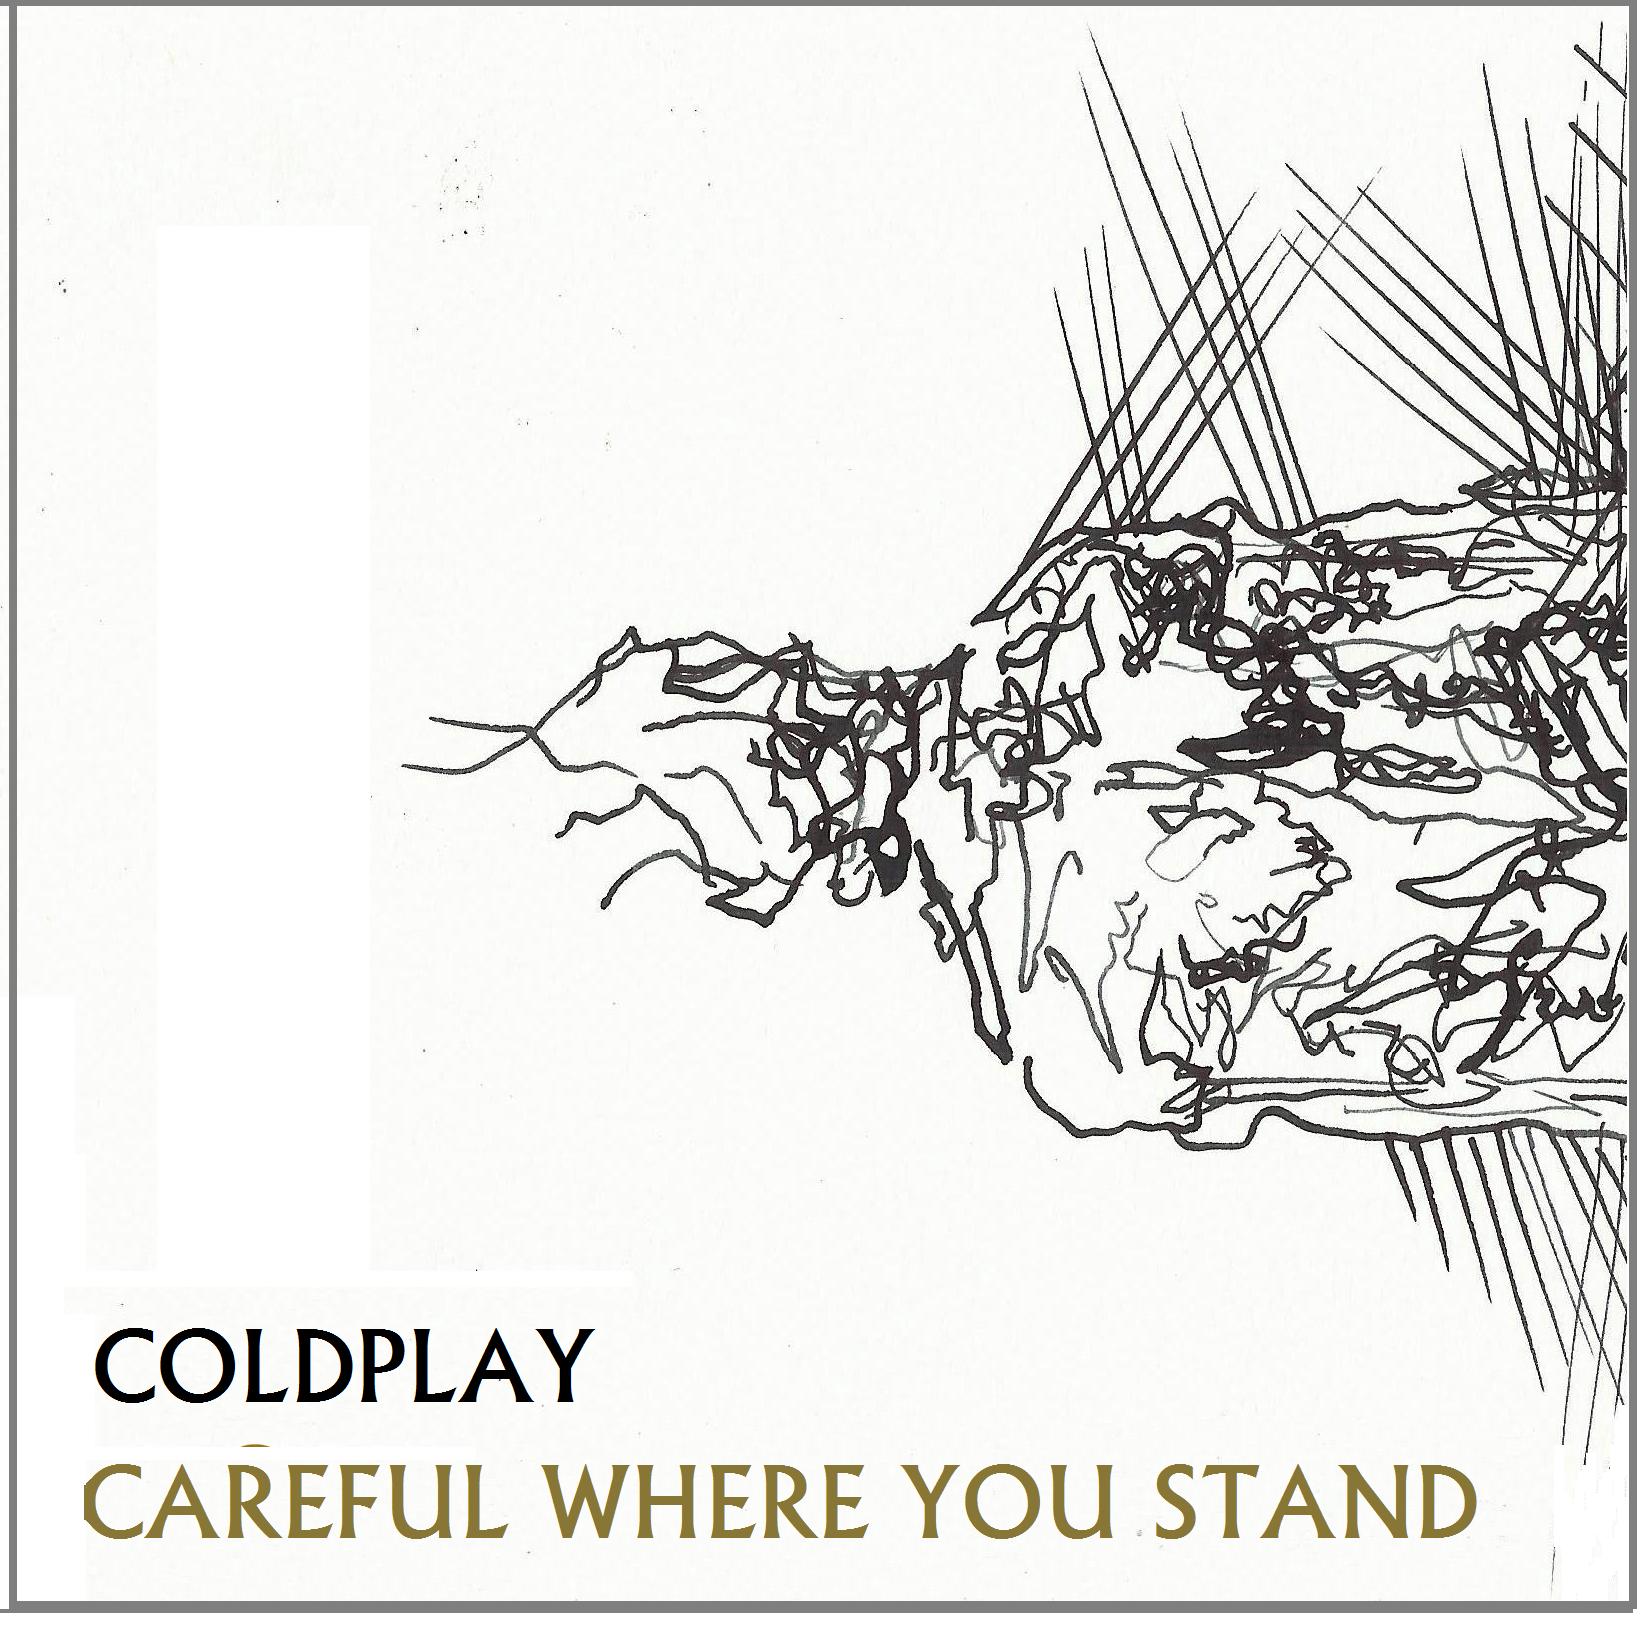 Coldplay - Careful Where You Stand Lyrics - YouTube